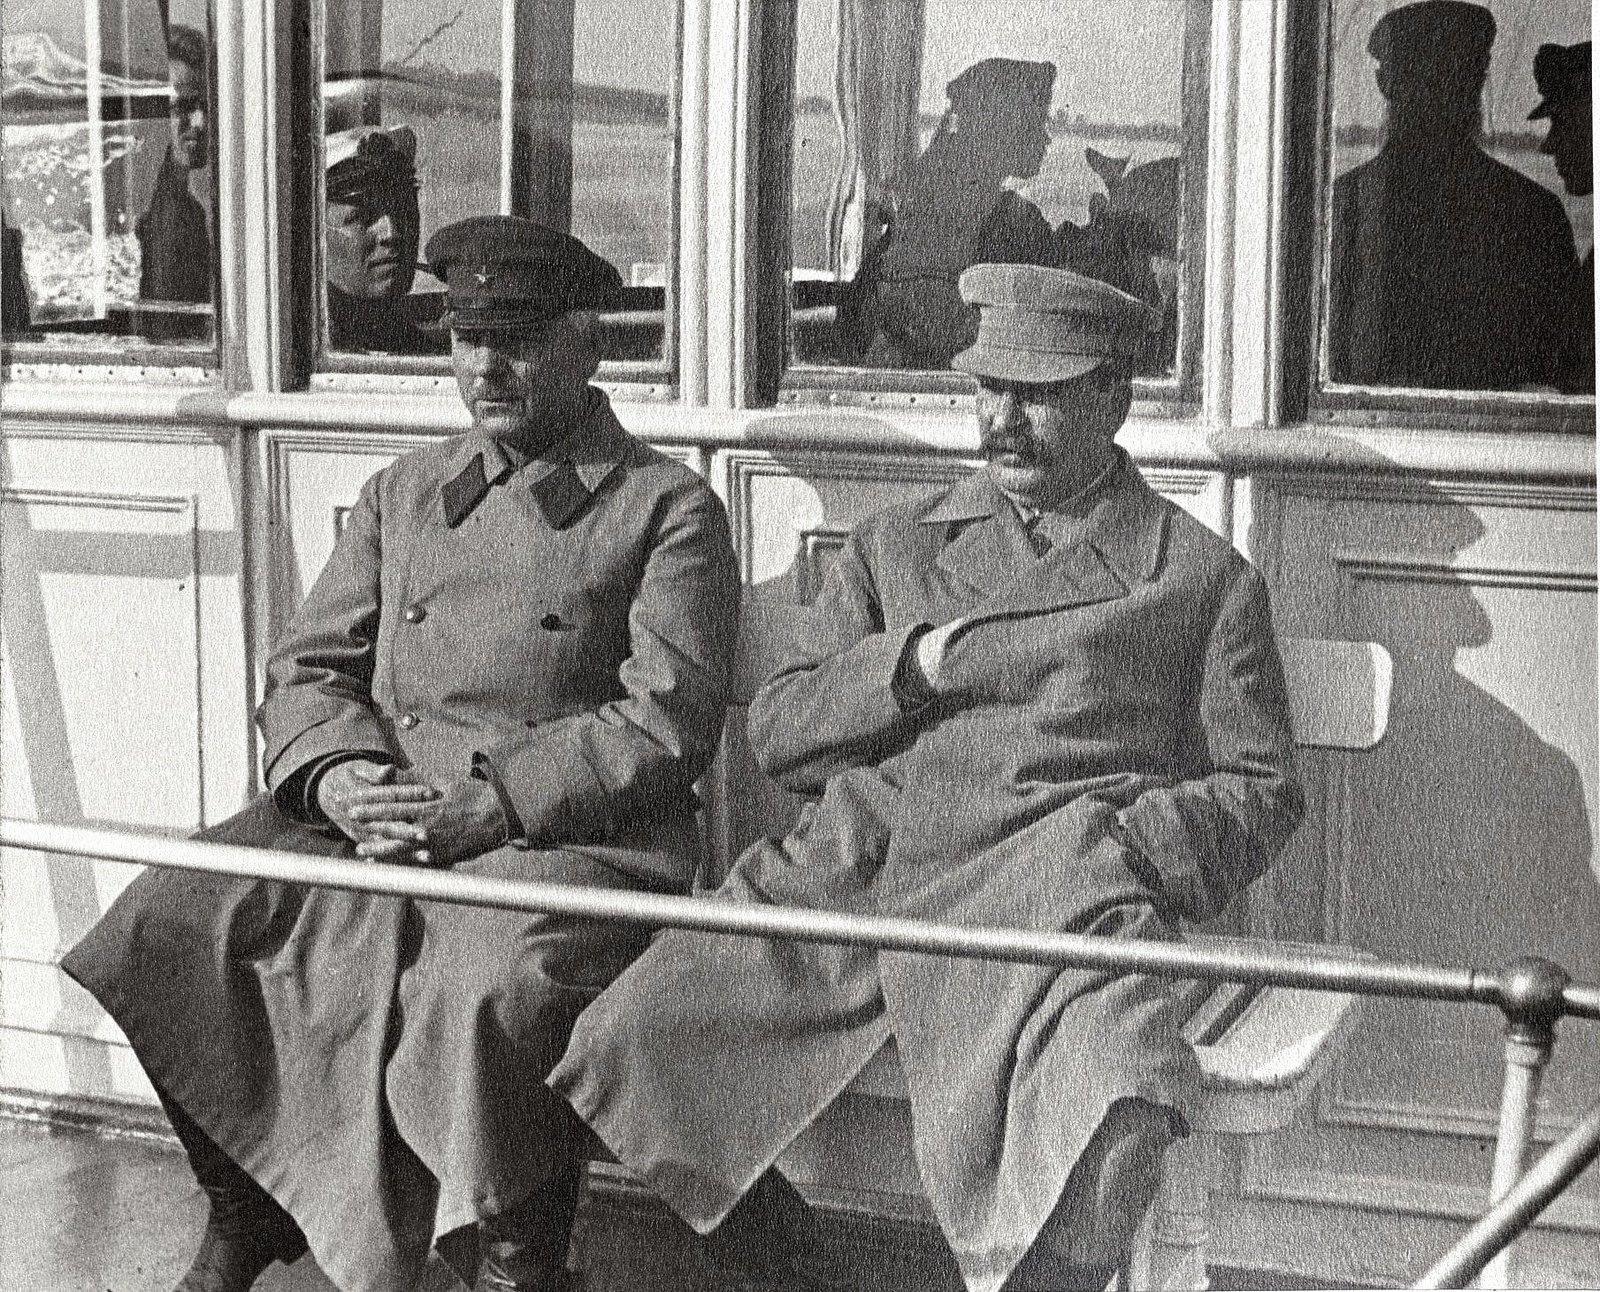 27. И.В. Сталин и К.Е. Ворошилов. Теплоход Клара Цеткин. На заднем плане команда теплохода. Август 1933